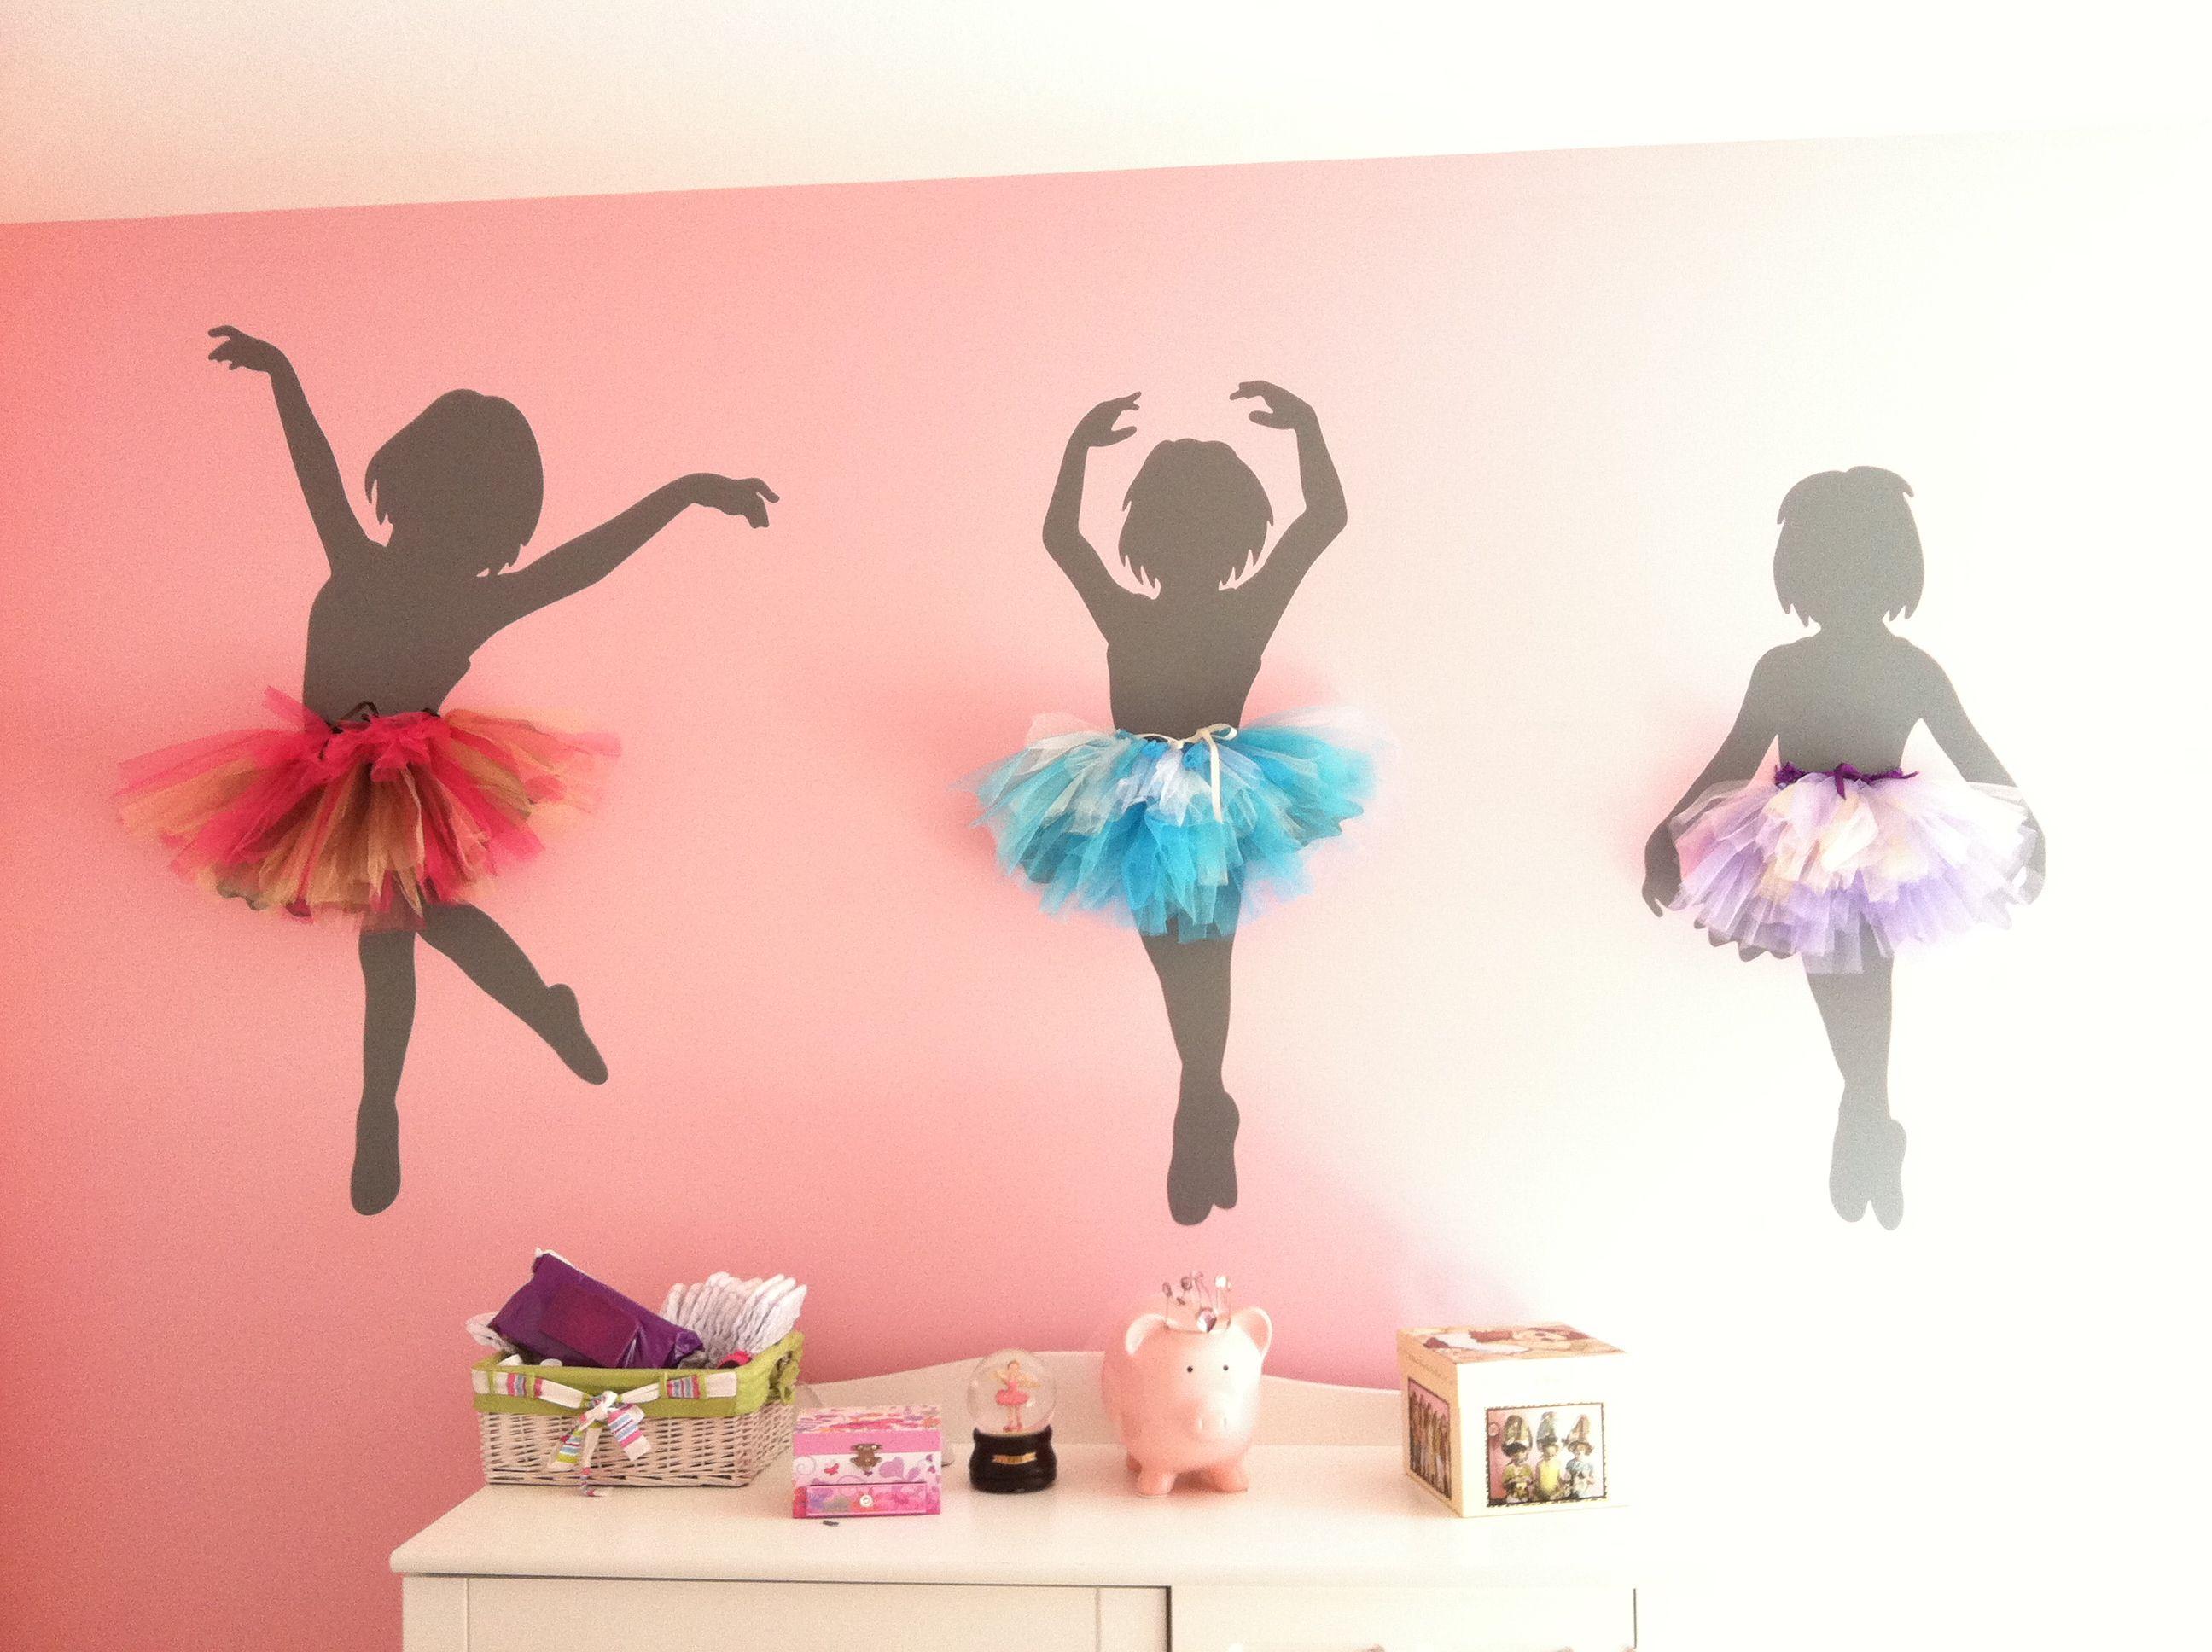 Pin By Vanessa Weiss On Kids Rooms Ballerina Bedroom Decor Ballet Room Ballerina Bedroom